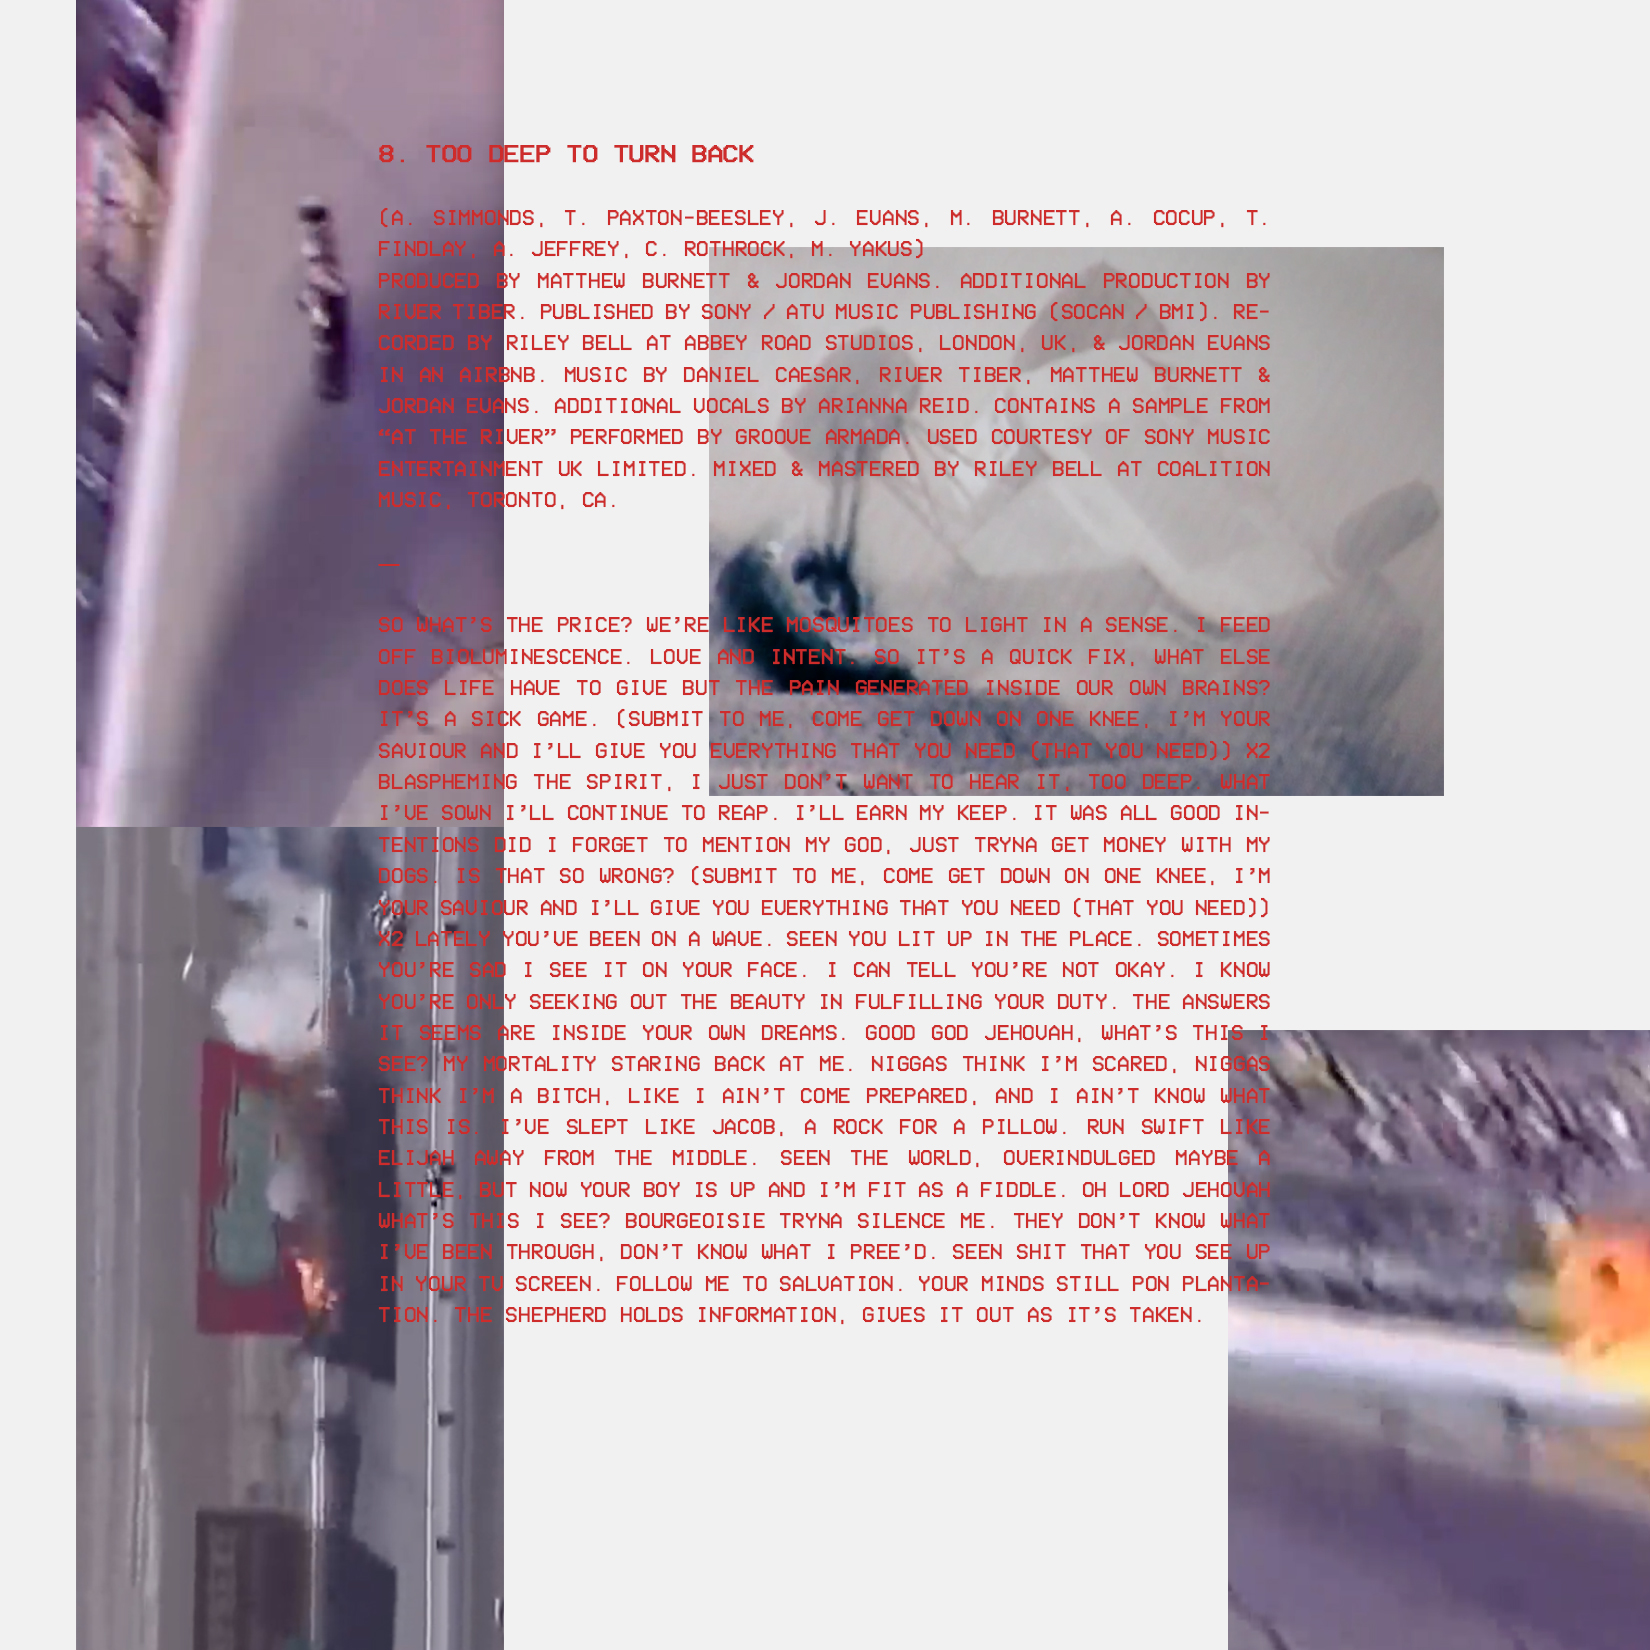 casestudy-linernotes-PG-09.jpg